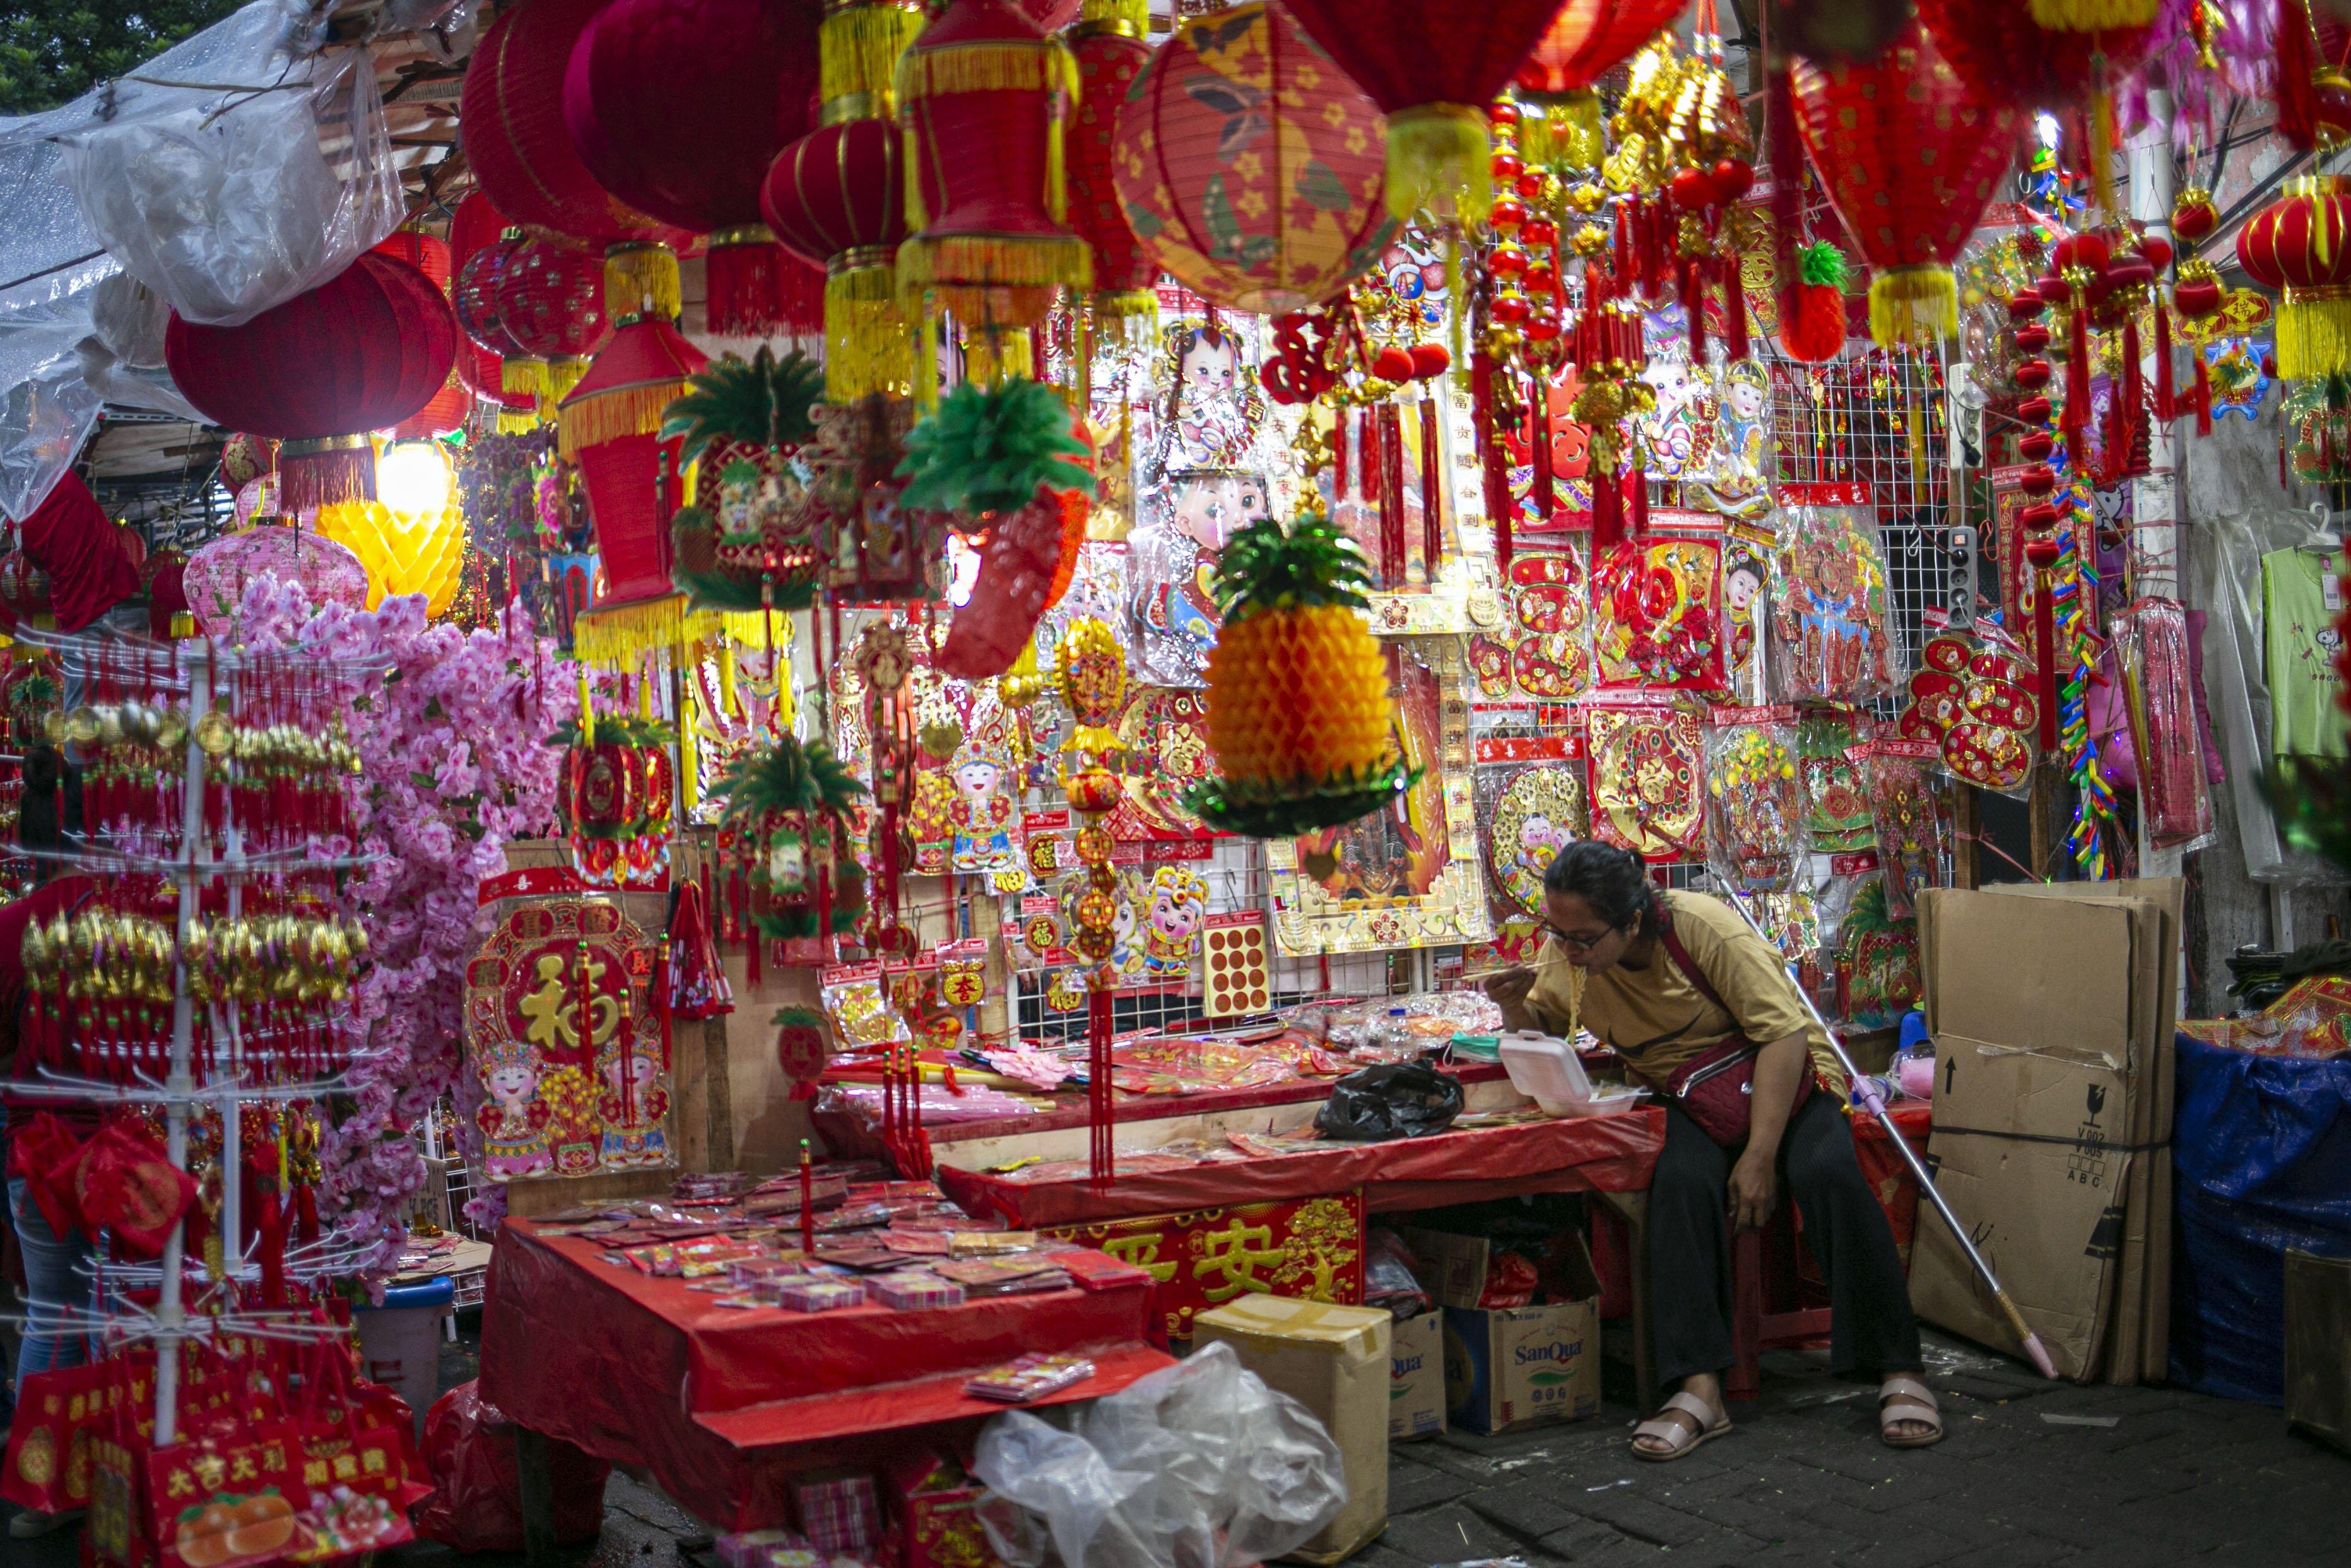 Pedagang menyantap makanan dikios pernak-pernik Imlek yang dijual di Pasar Glodok, Jakarta, Kamis (11/2/2021). Pedagang di lokasi tersebut mengaku penjualan tahun ini anjlok hingga 80 persen dibandingkan tahun lalu akibat pandemi COVID 19.